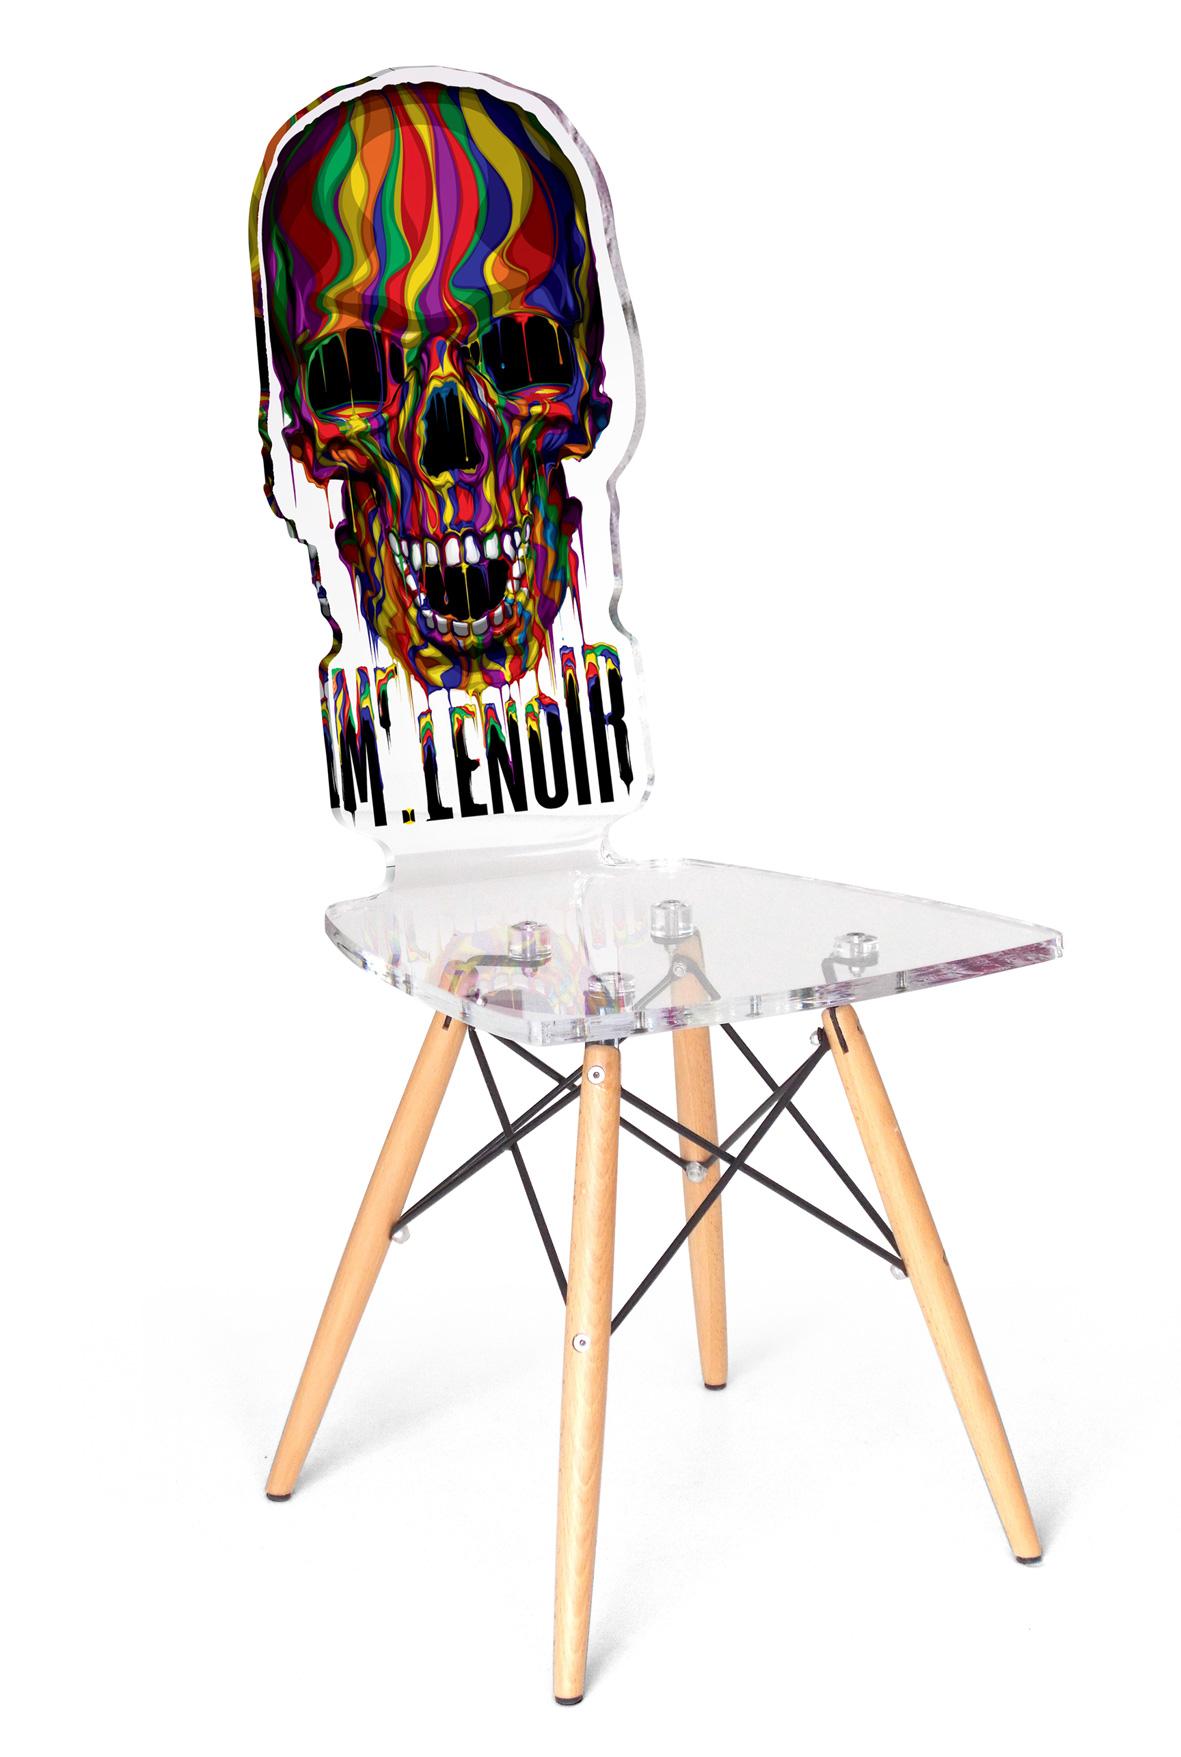 Djibrill cisse chaise Skull